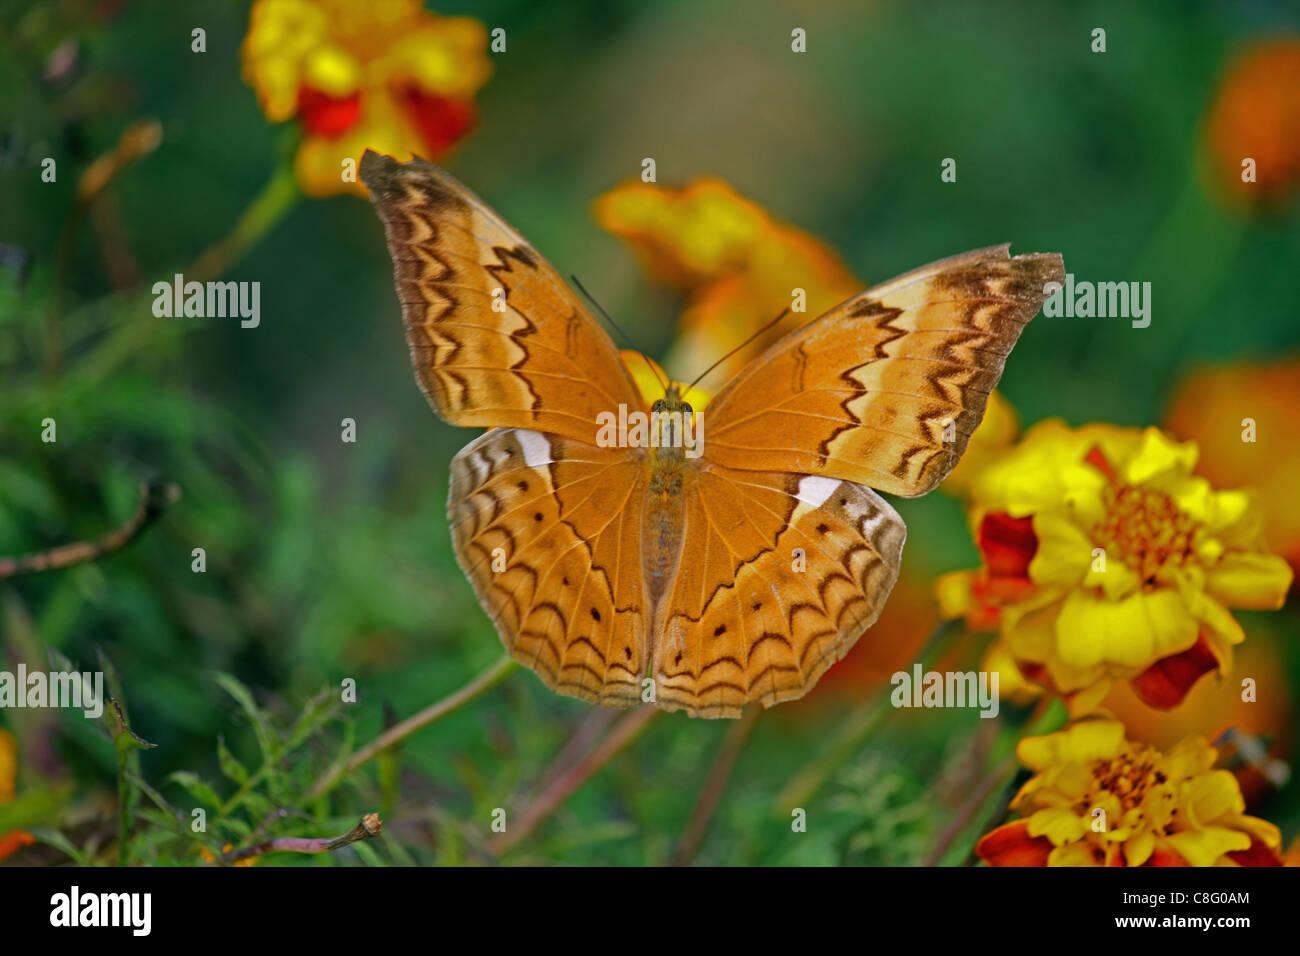 Bộ sưu tập cánh vẩy 5 - Page 4 Cirrochroa-thais-tamil-yeoman-insect-butterfly-india-C8G0AM